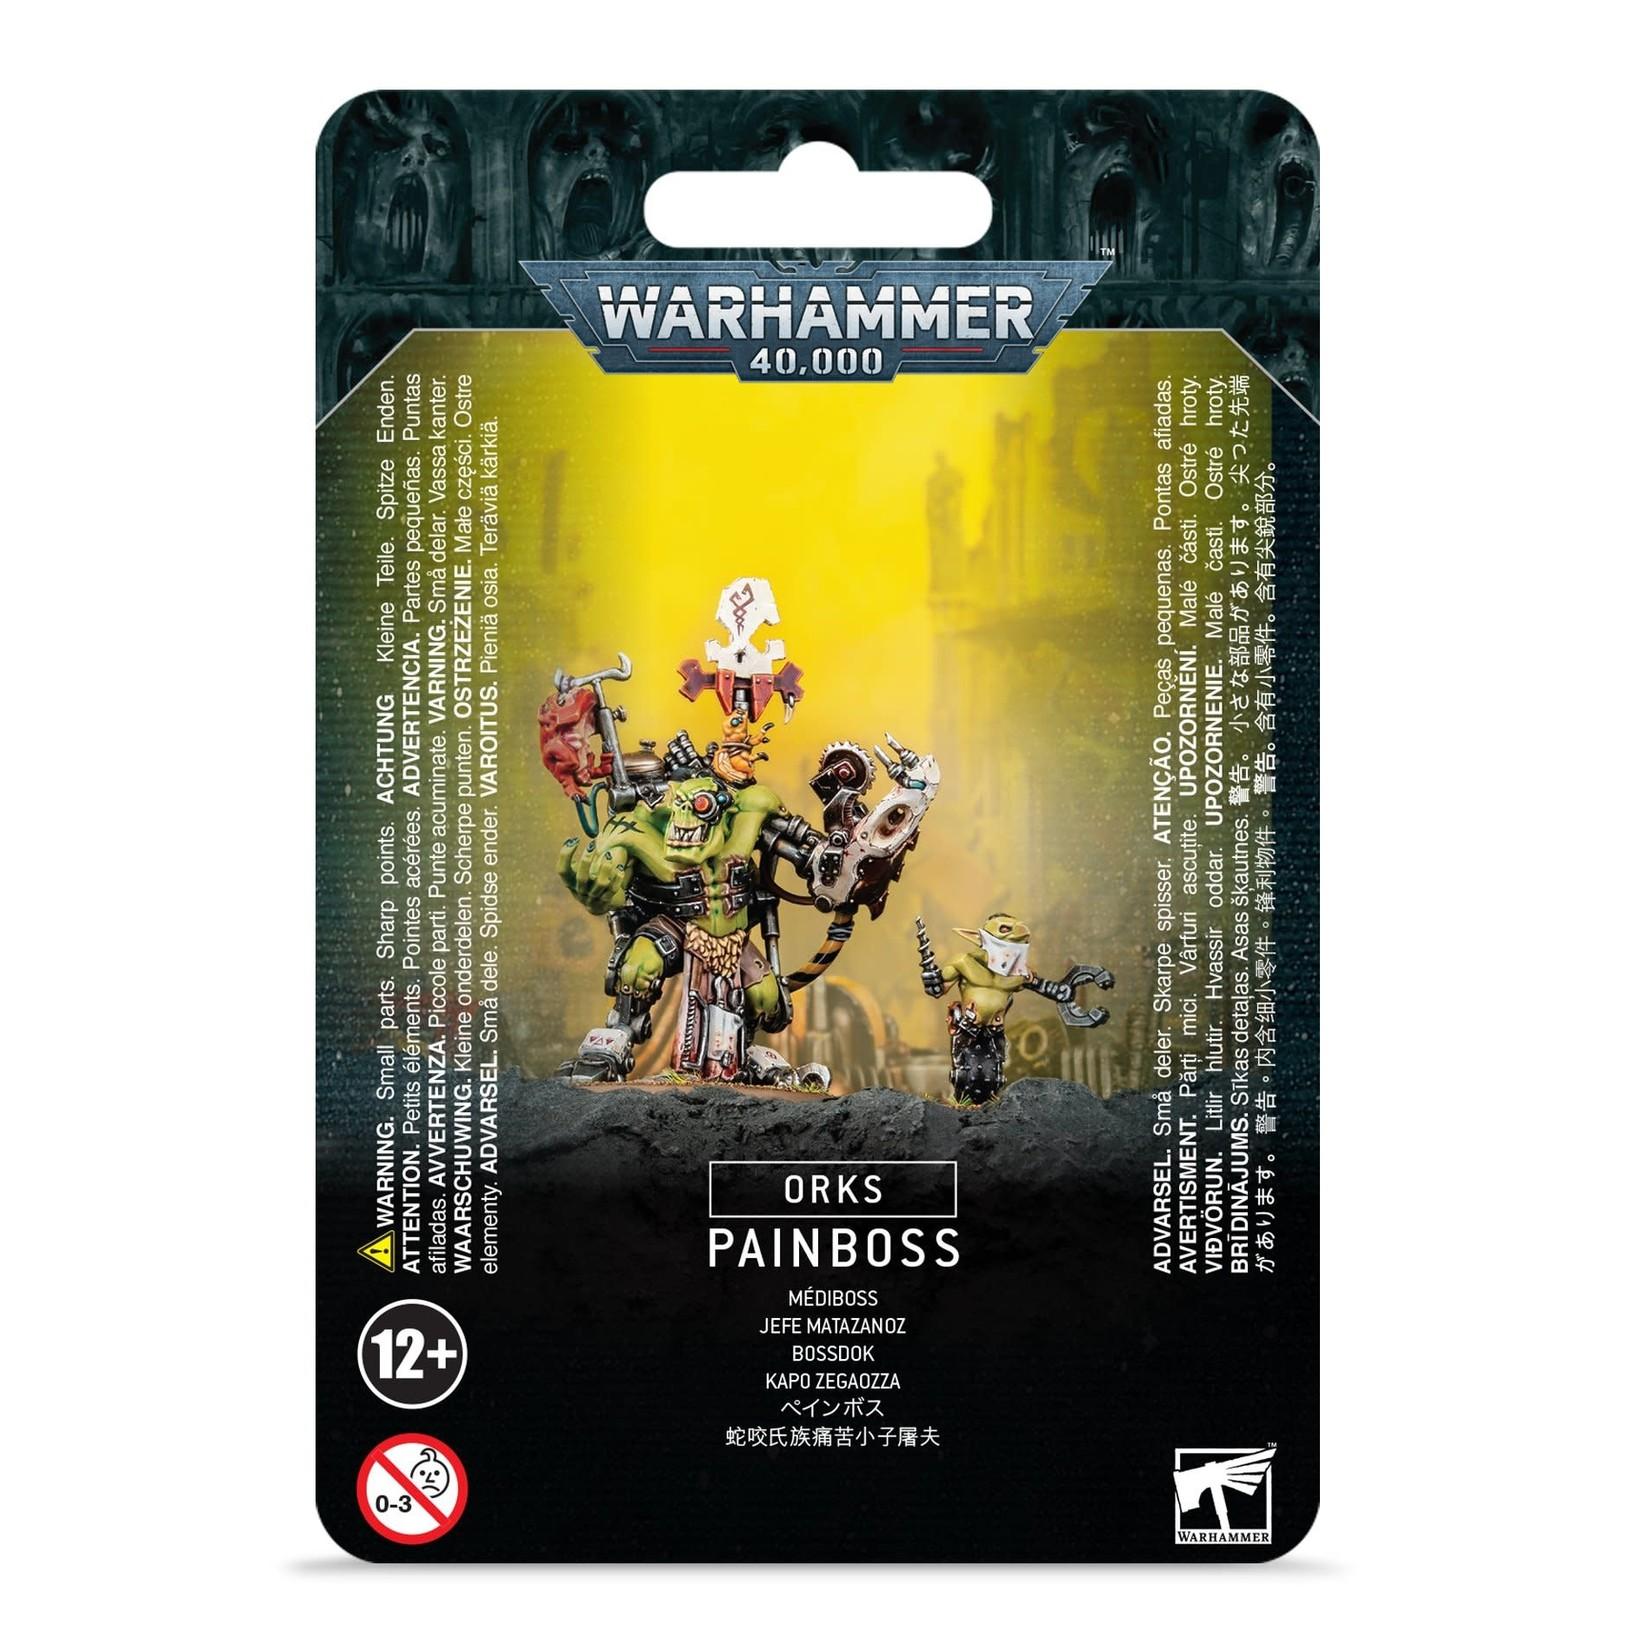 Warhammer 40K Orks - Painboss